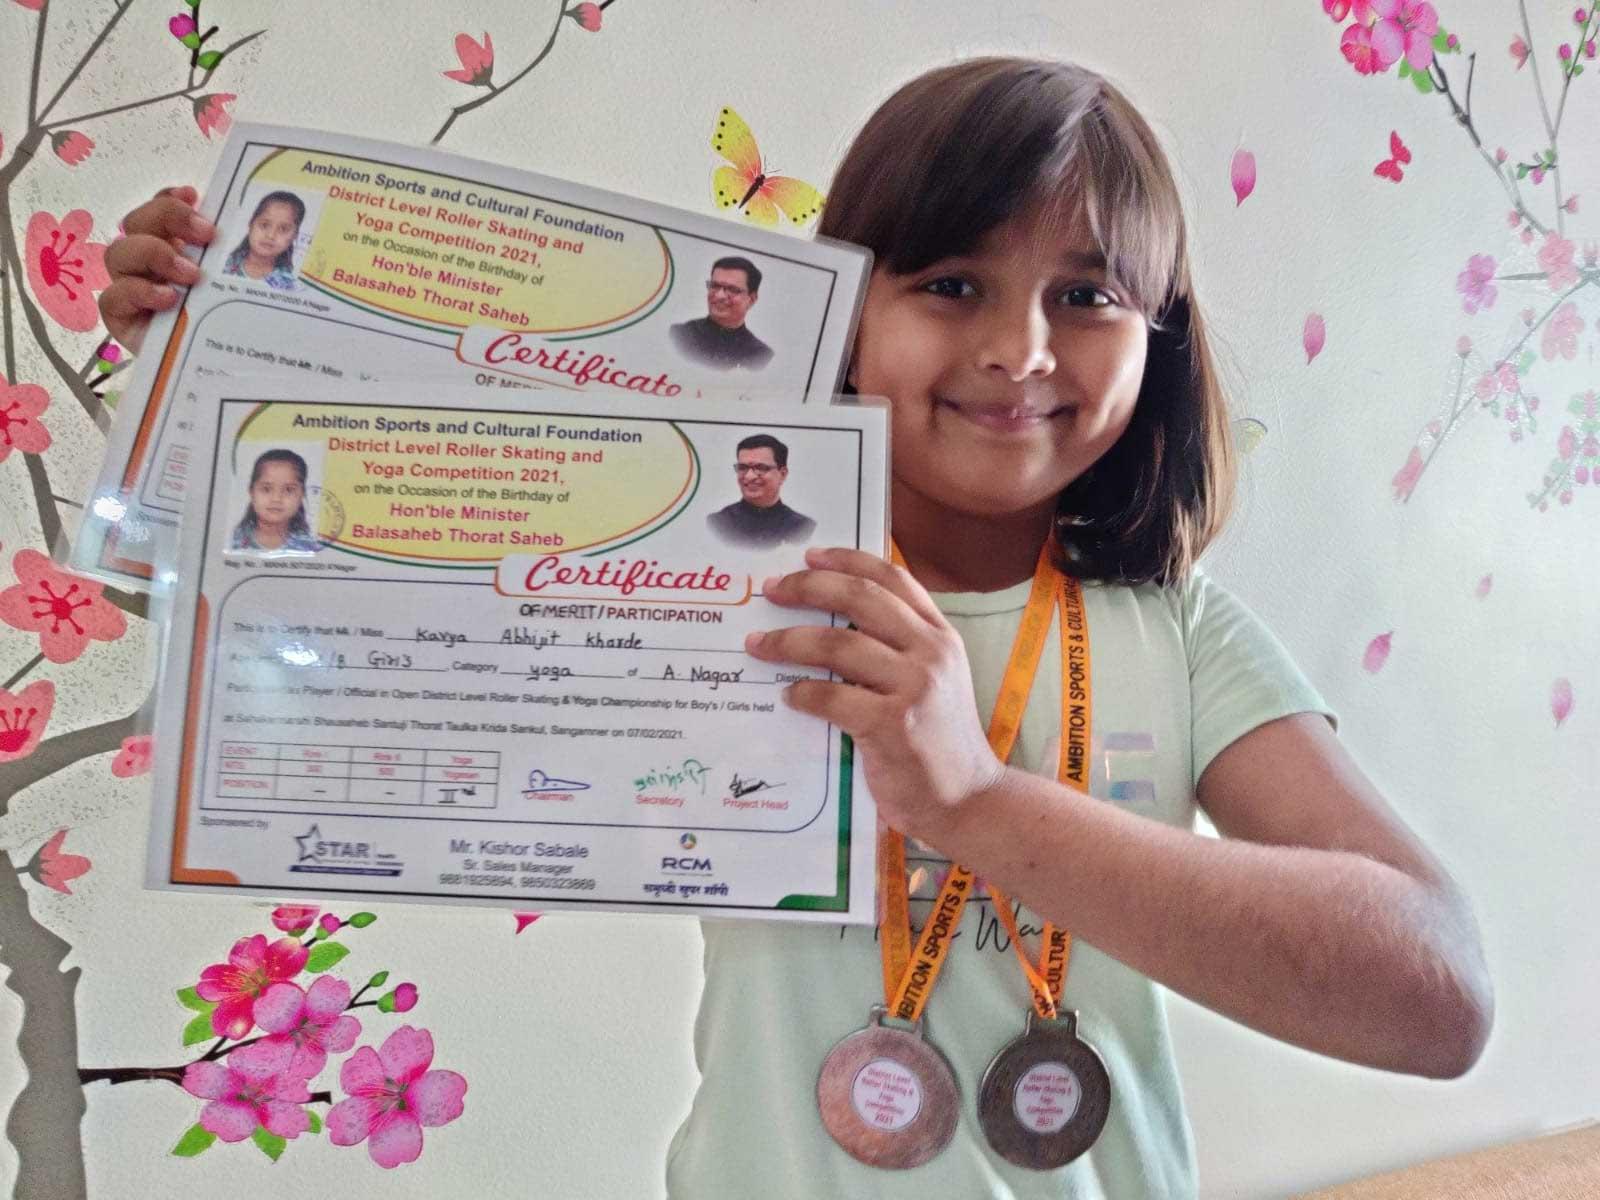 miss-kavya-kharde-got-silver-medal-in-district-level-matches-held-at-sangamner